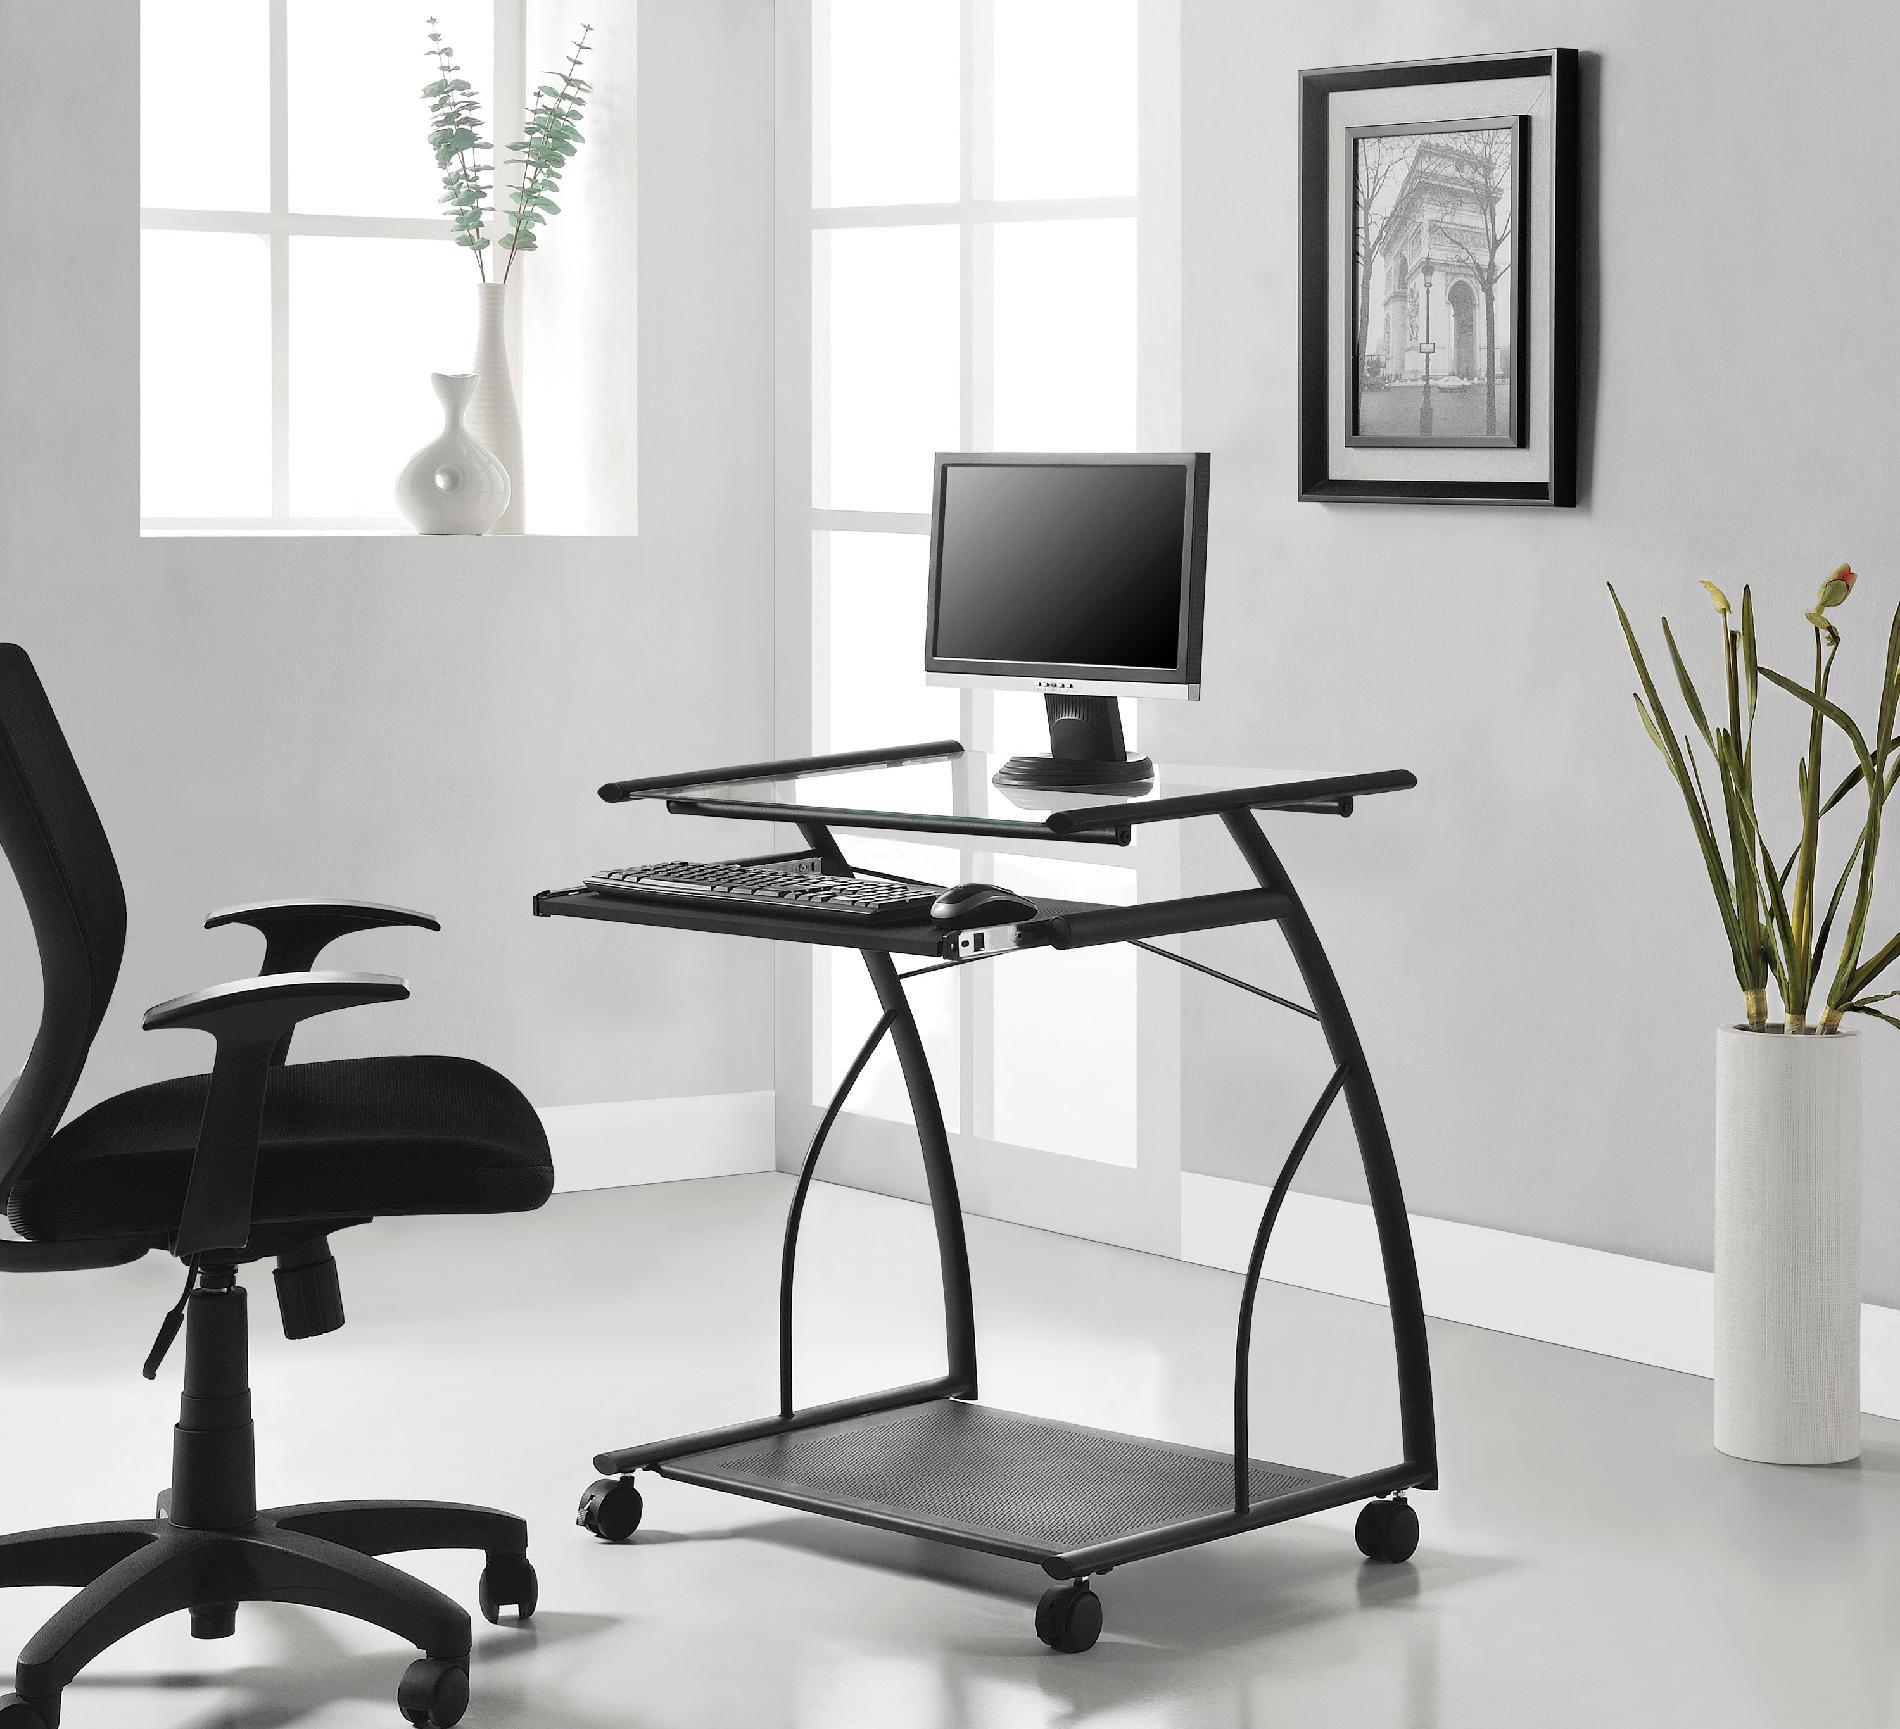 chair mobile stand cheap recliner chairs under 100 dorel computer cart desk black